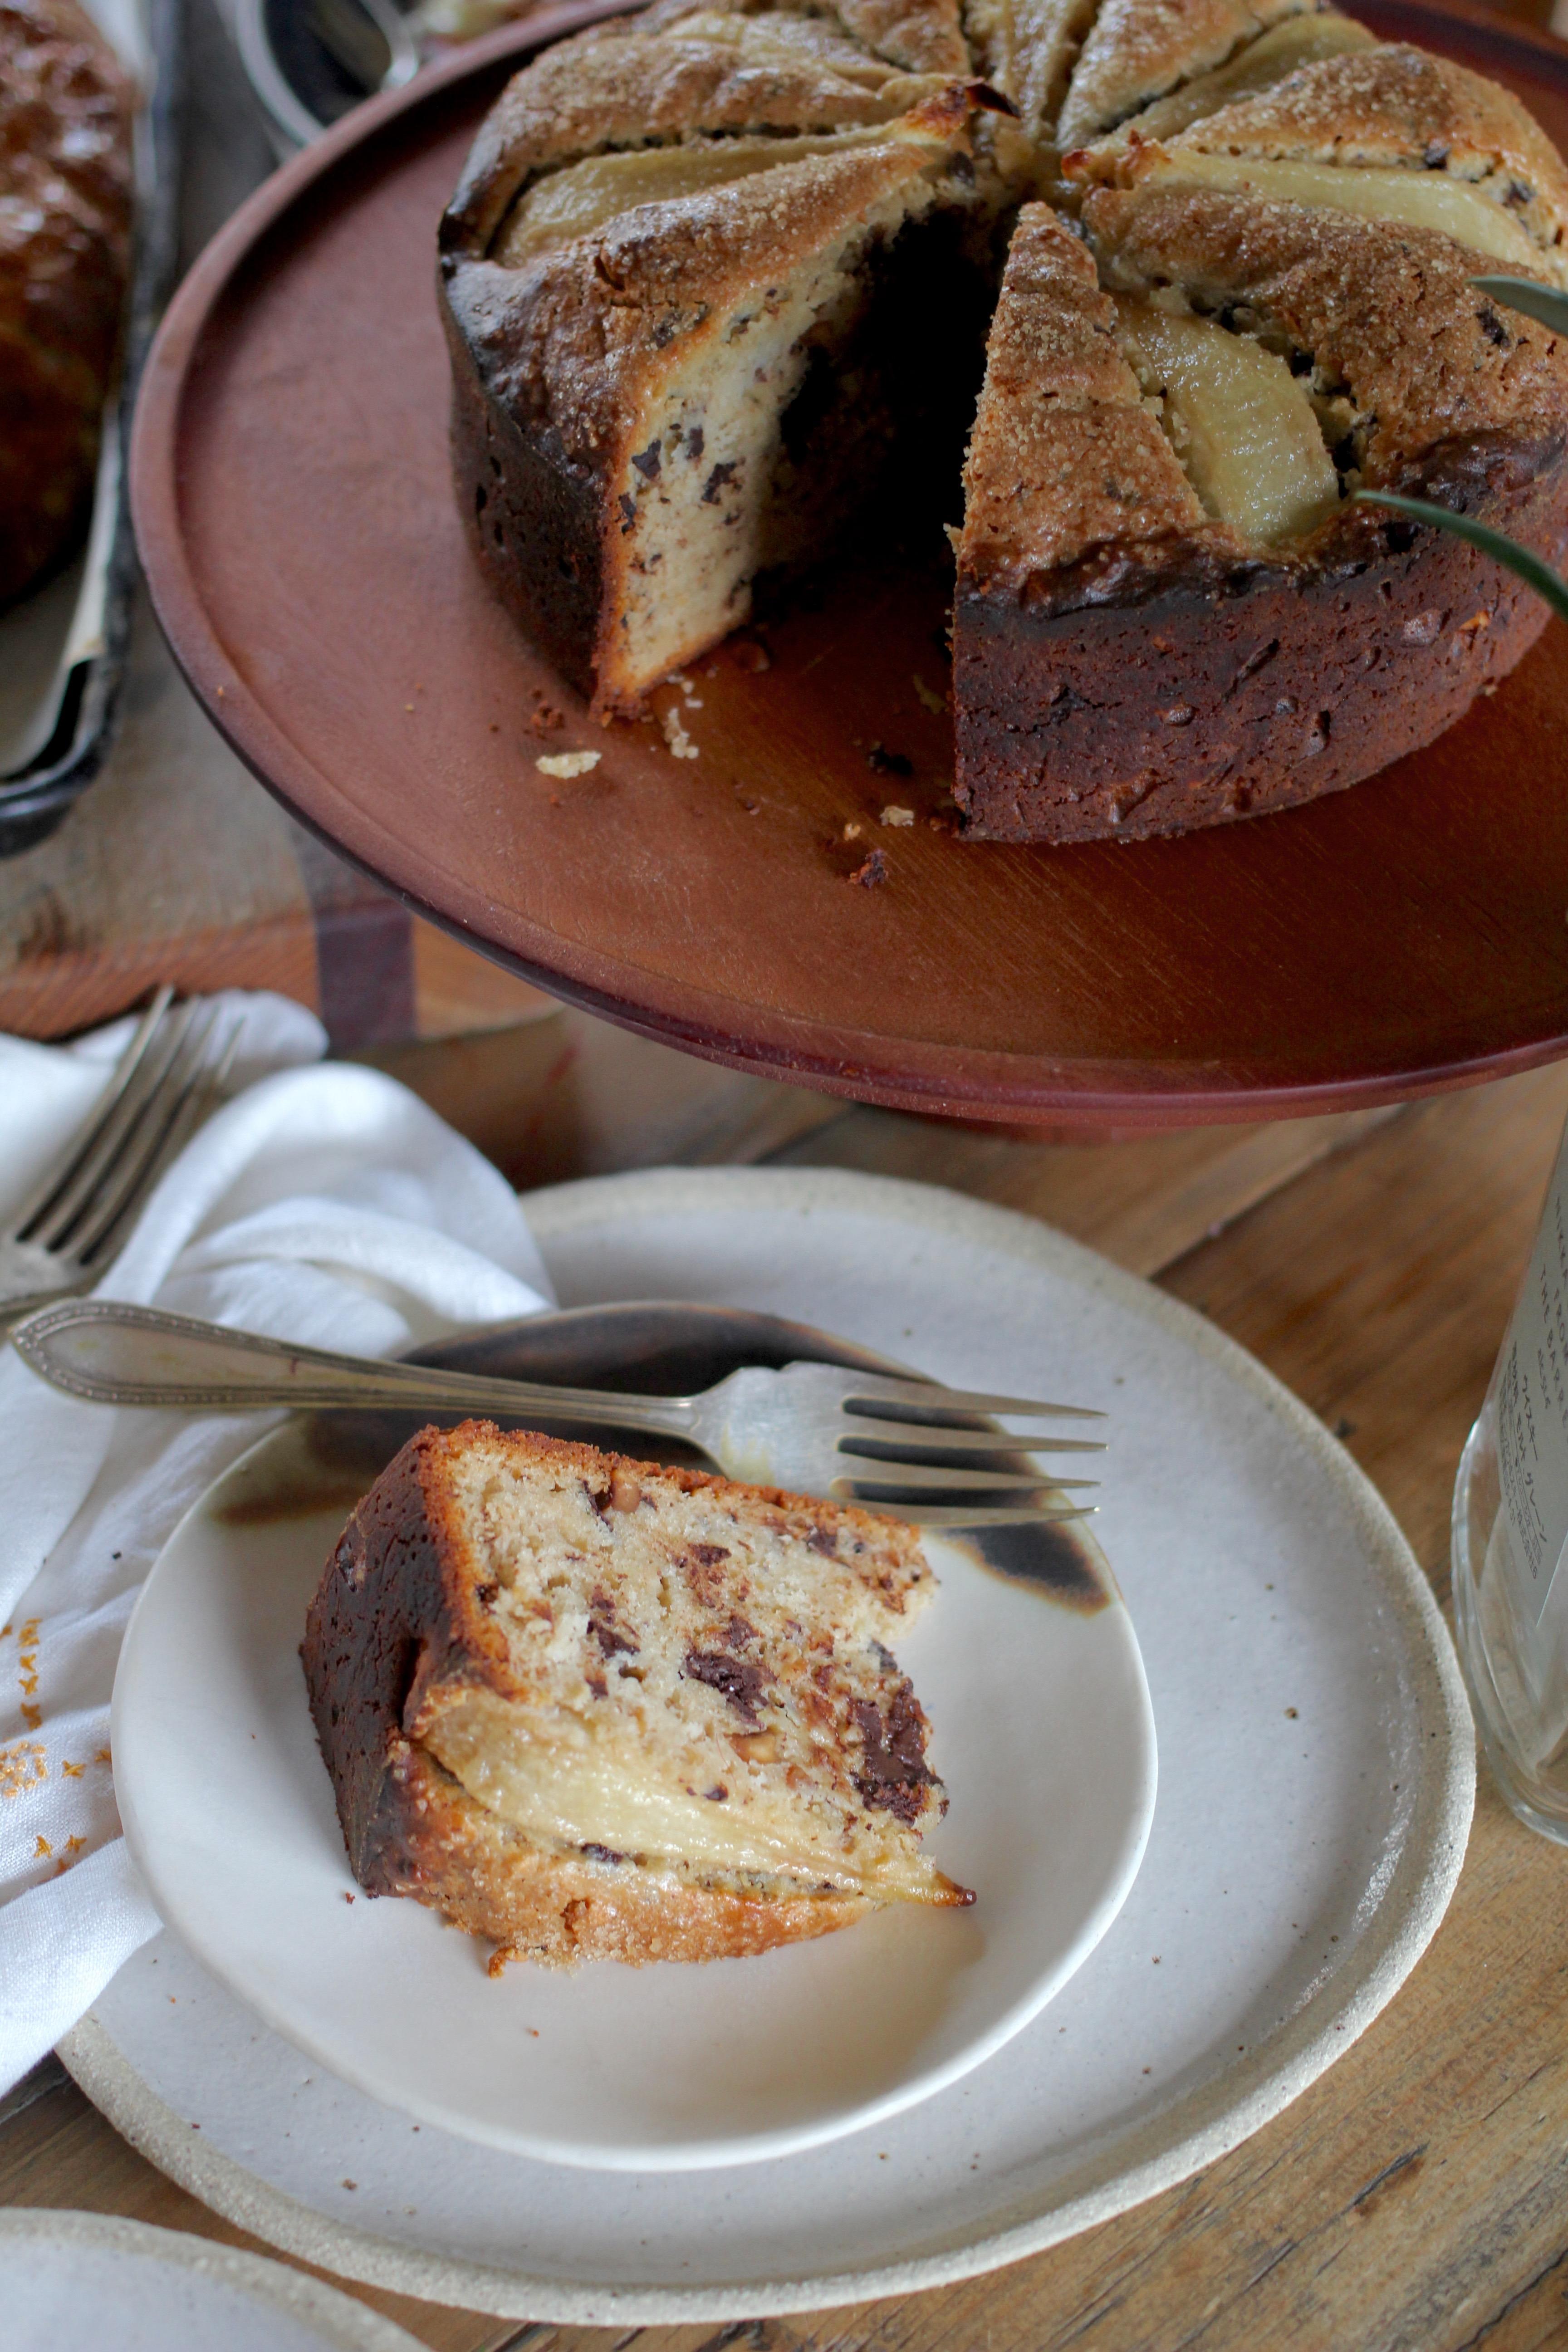 Pear Buckwheat Cake With Rosemary Dark Chocolate Amp Hazelnuts